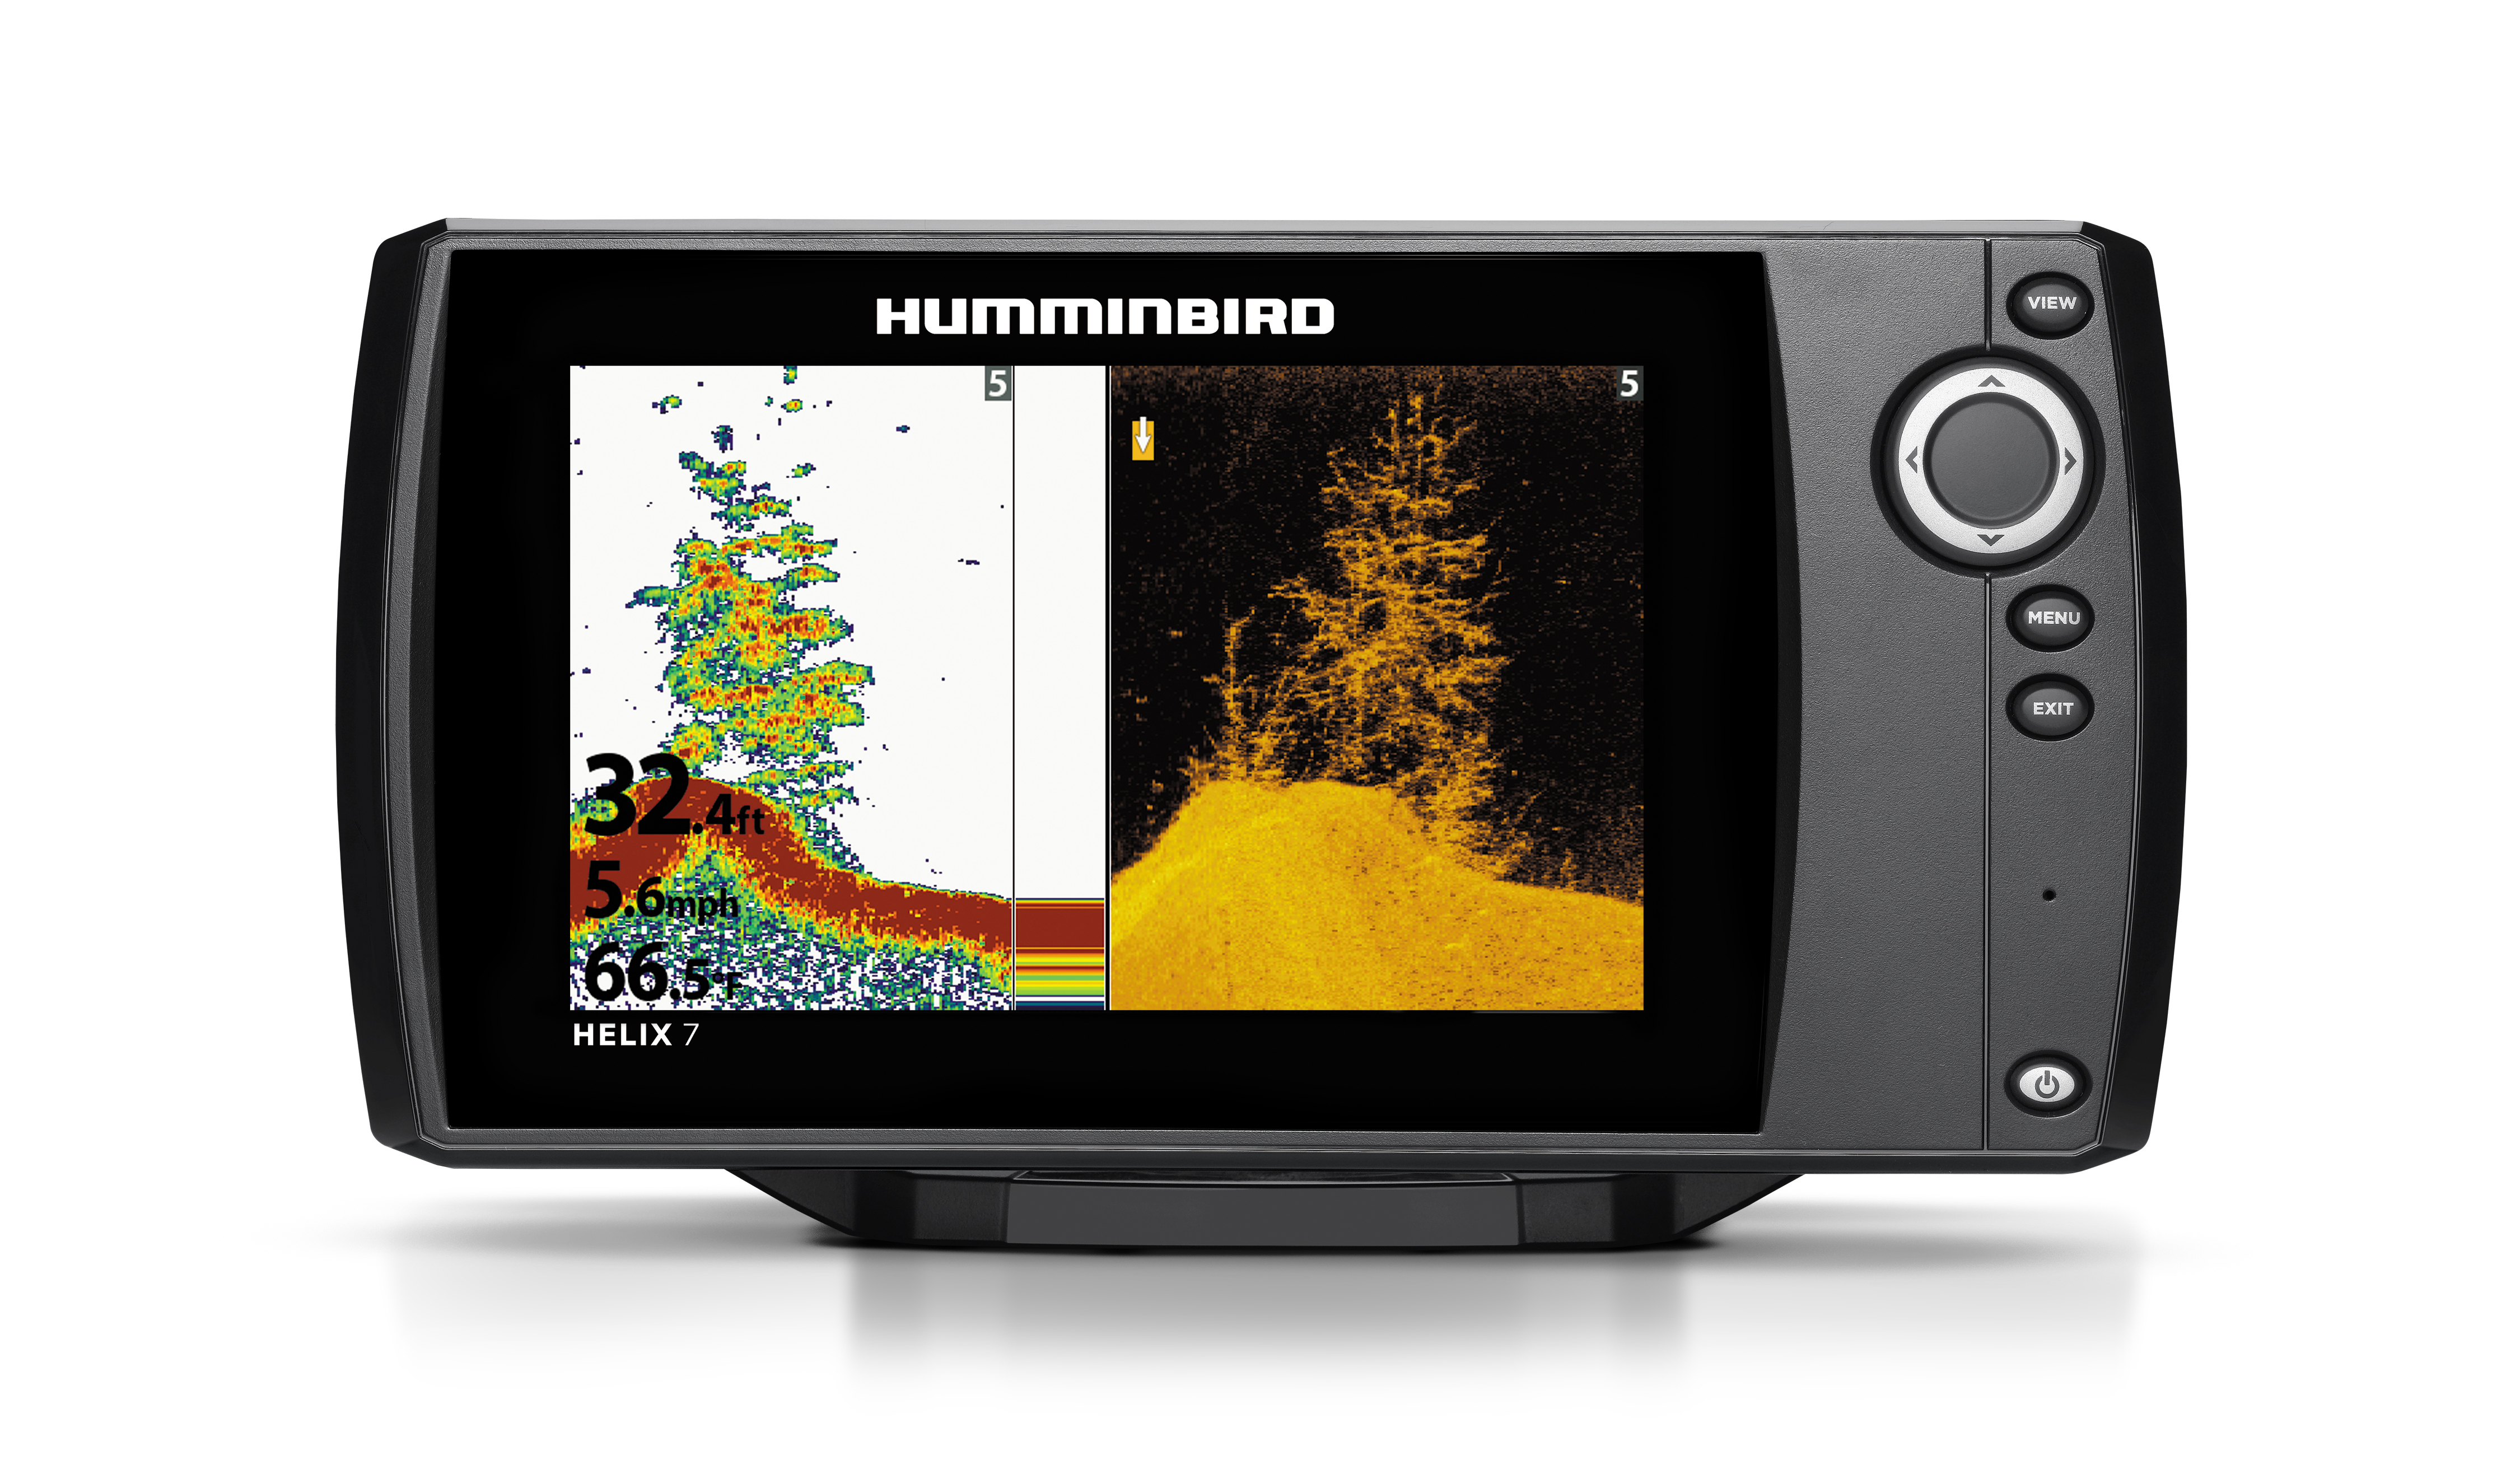 Humminbird helix 7 chirp di g2 for Humminbird 410210 1 helix 5 chirp gps g2 fish finder